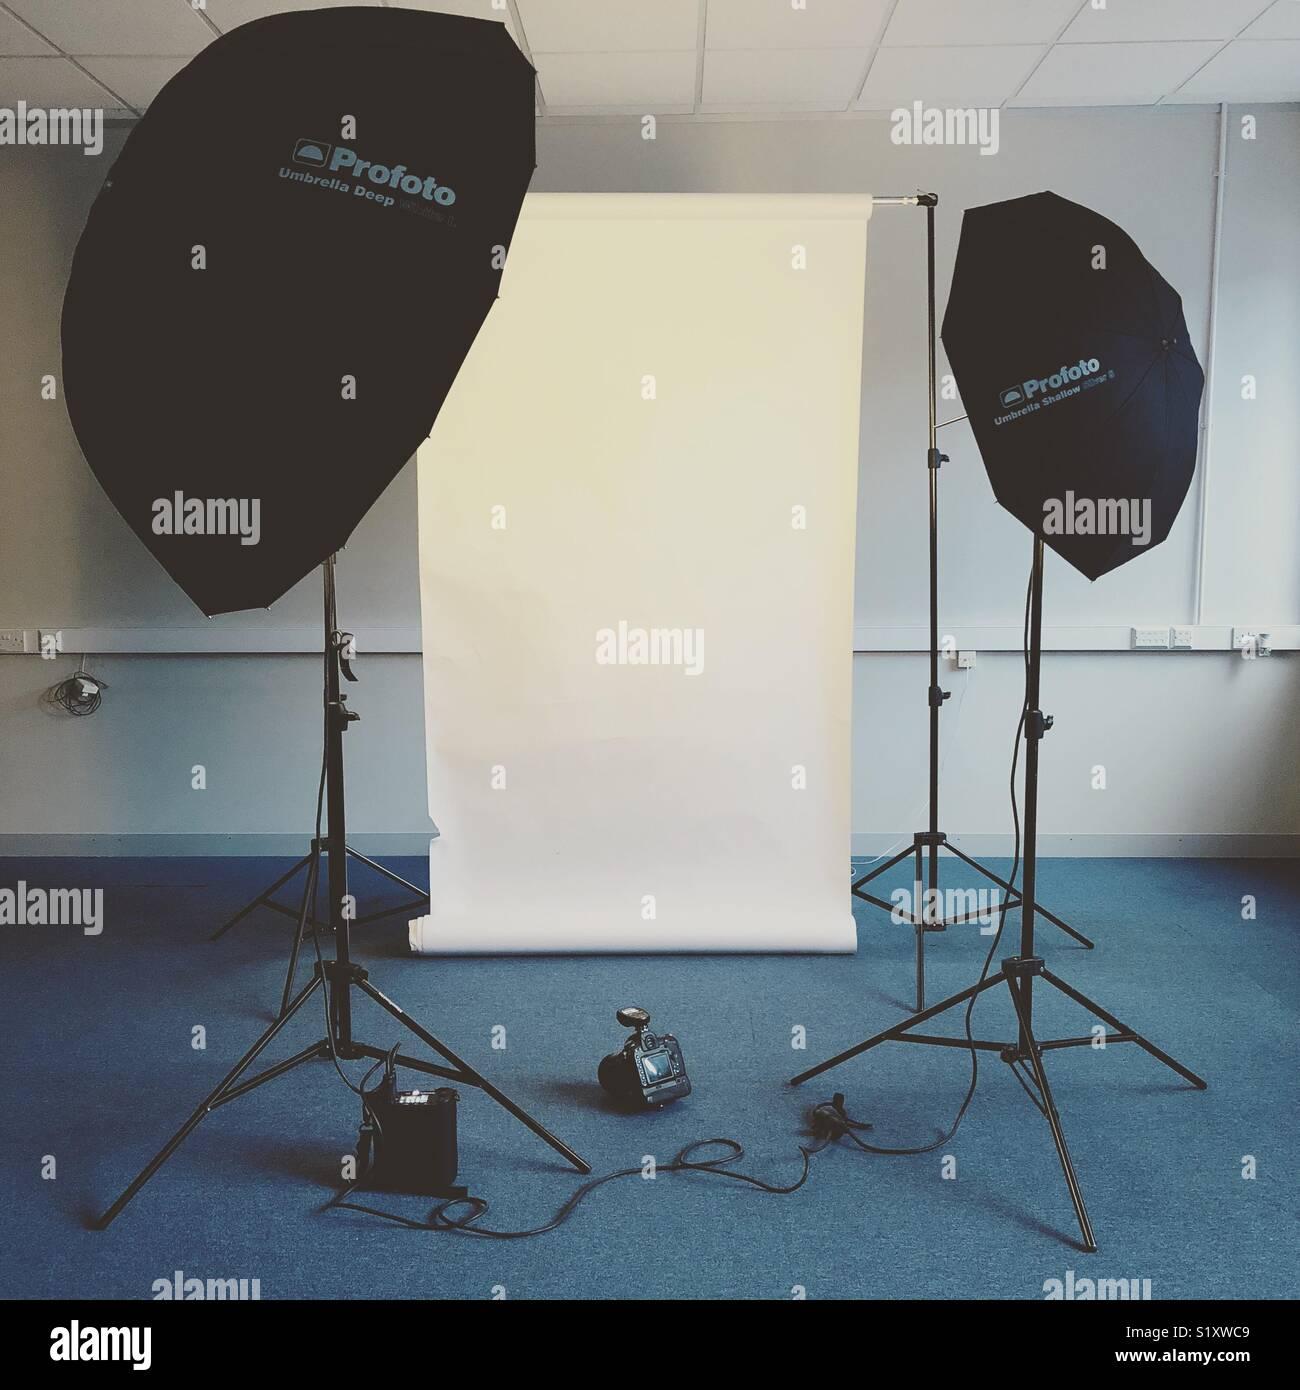 a professional photographer�s mobile studio setup with